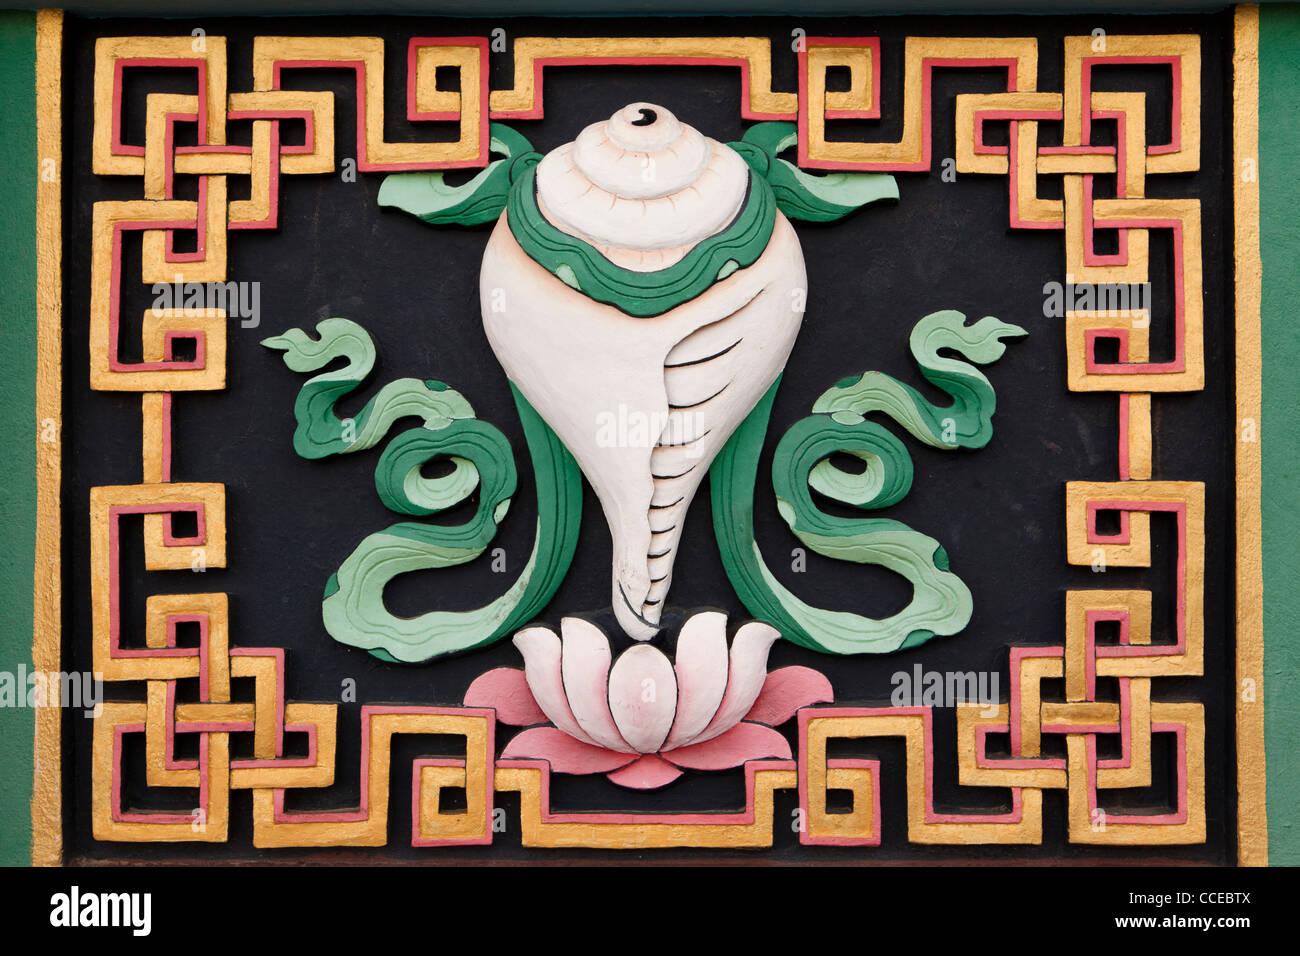 Indien, Arunachal Pradesh, Tawang, Khinmey Nyingma Kloster, Muschelschale, Sankha, auspicious symbol Stockbild